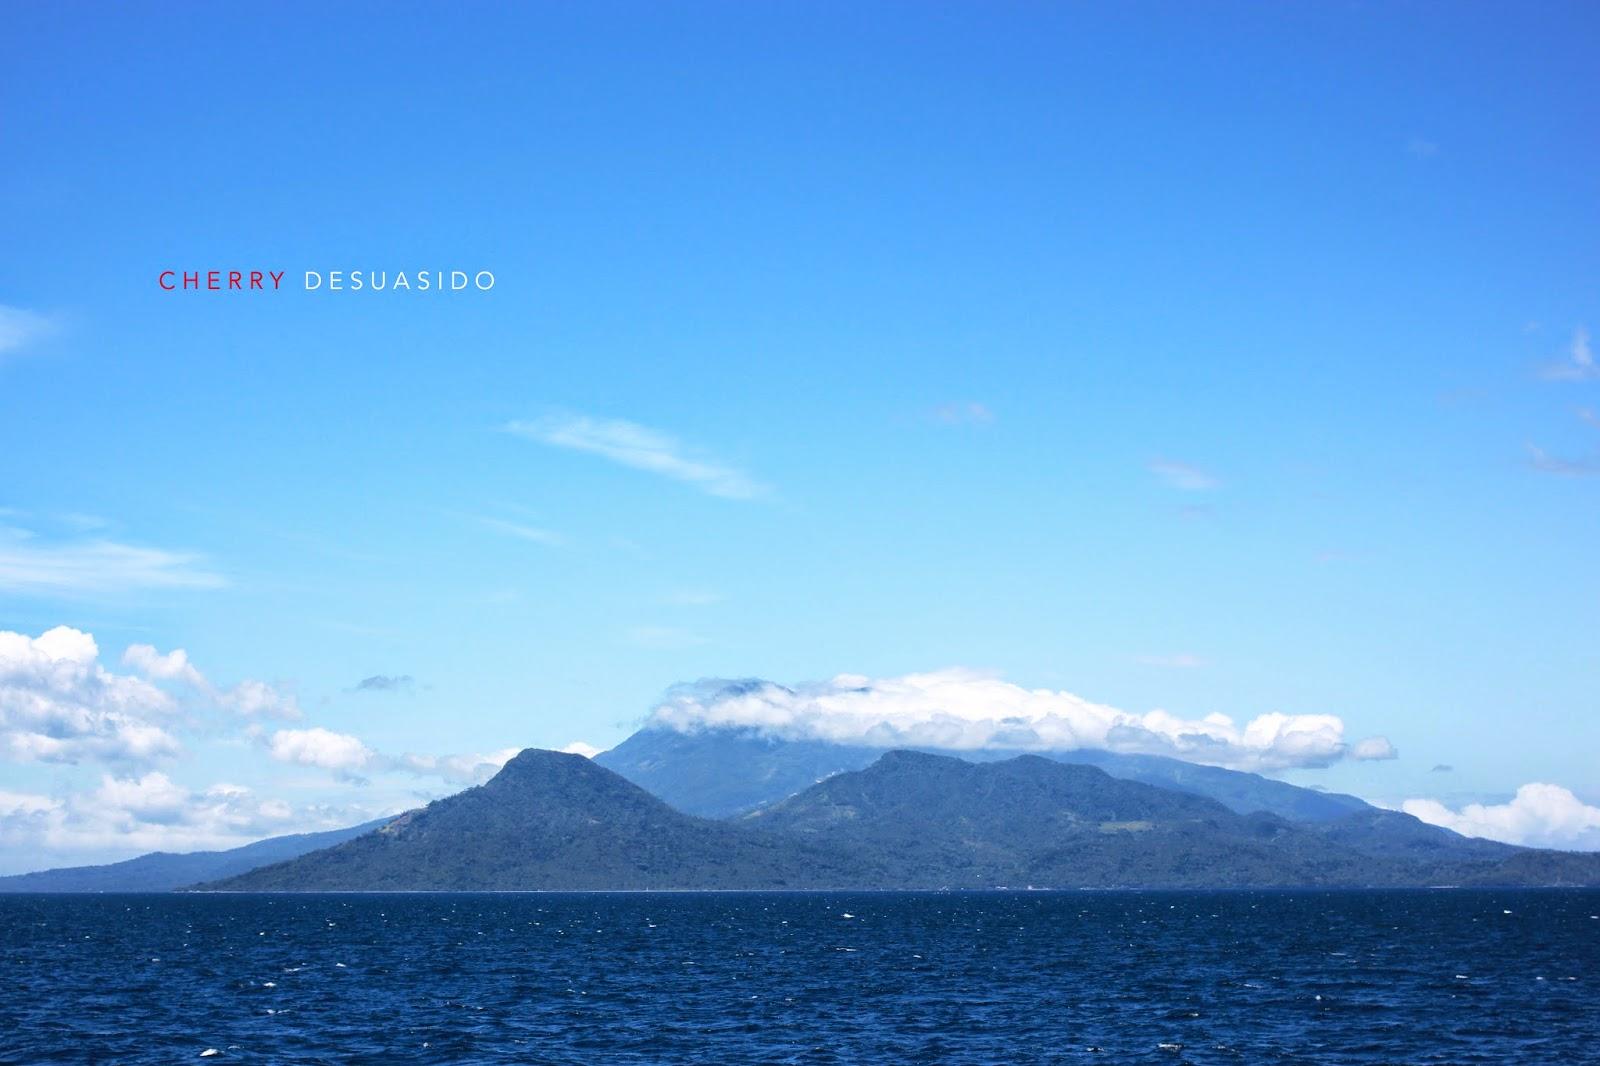 Camiguin Island, Mindanao